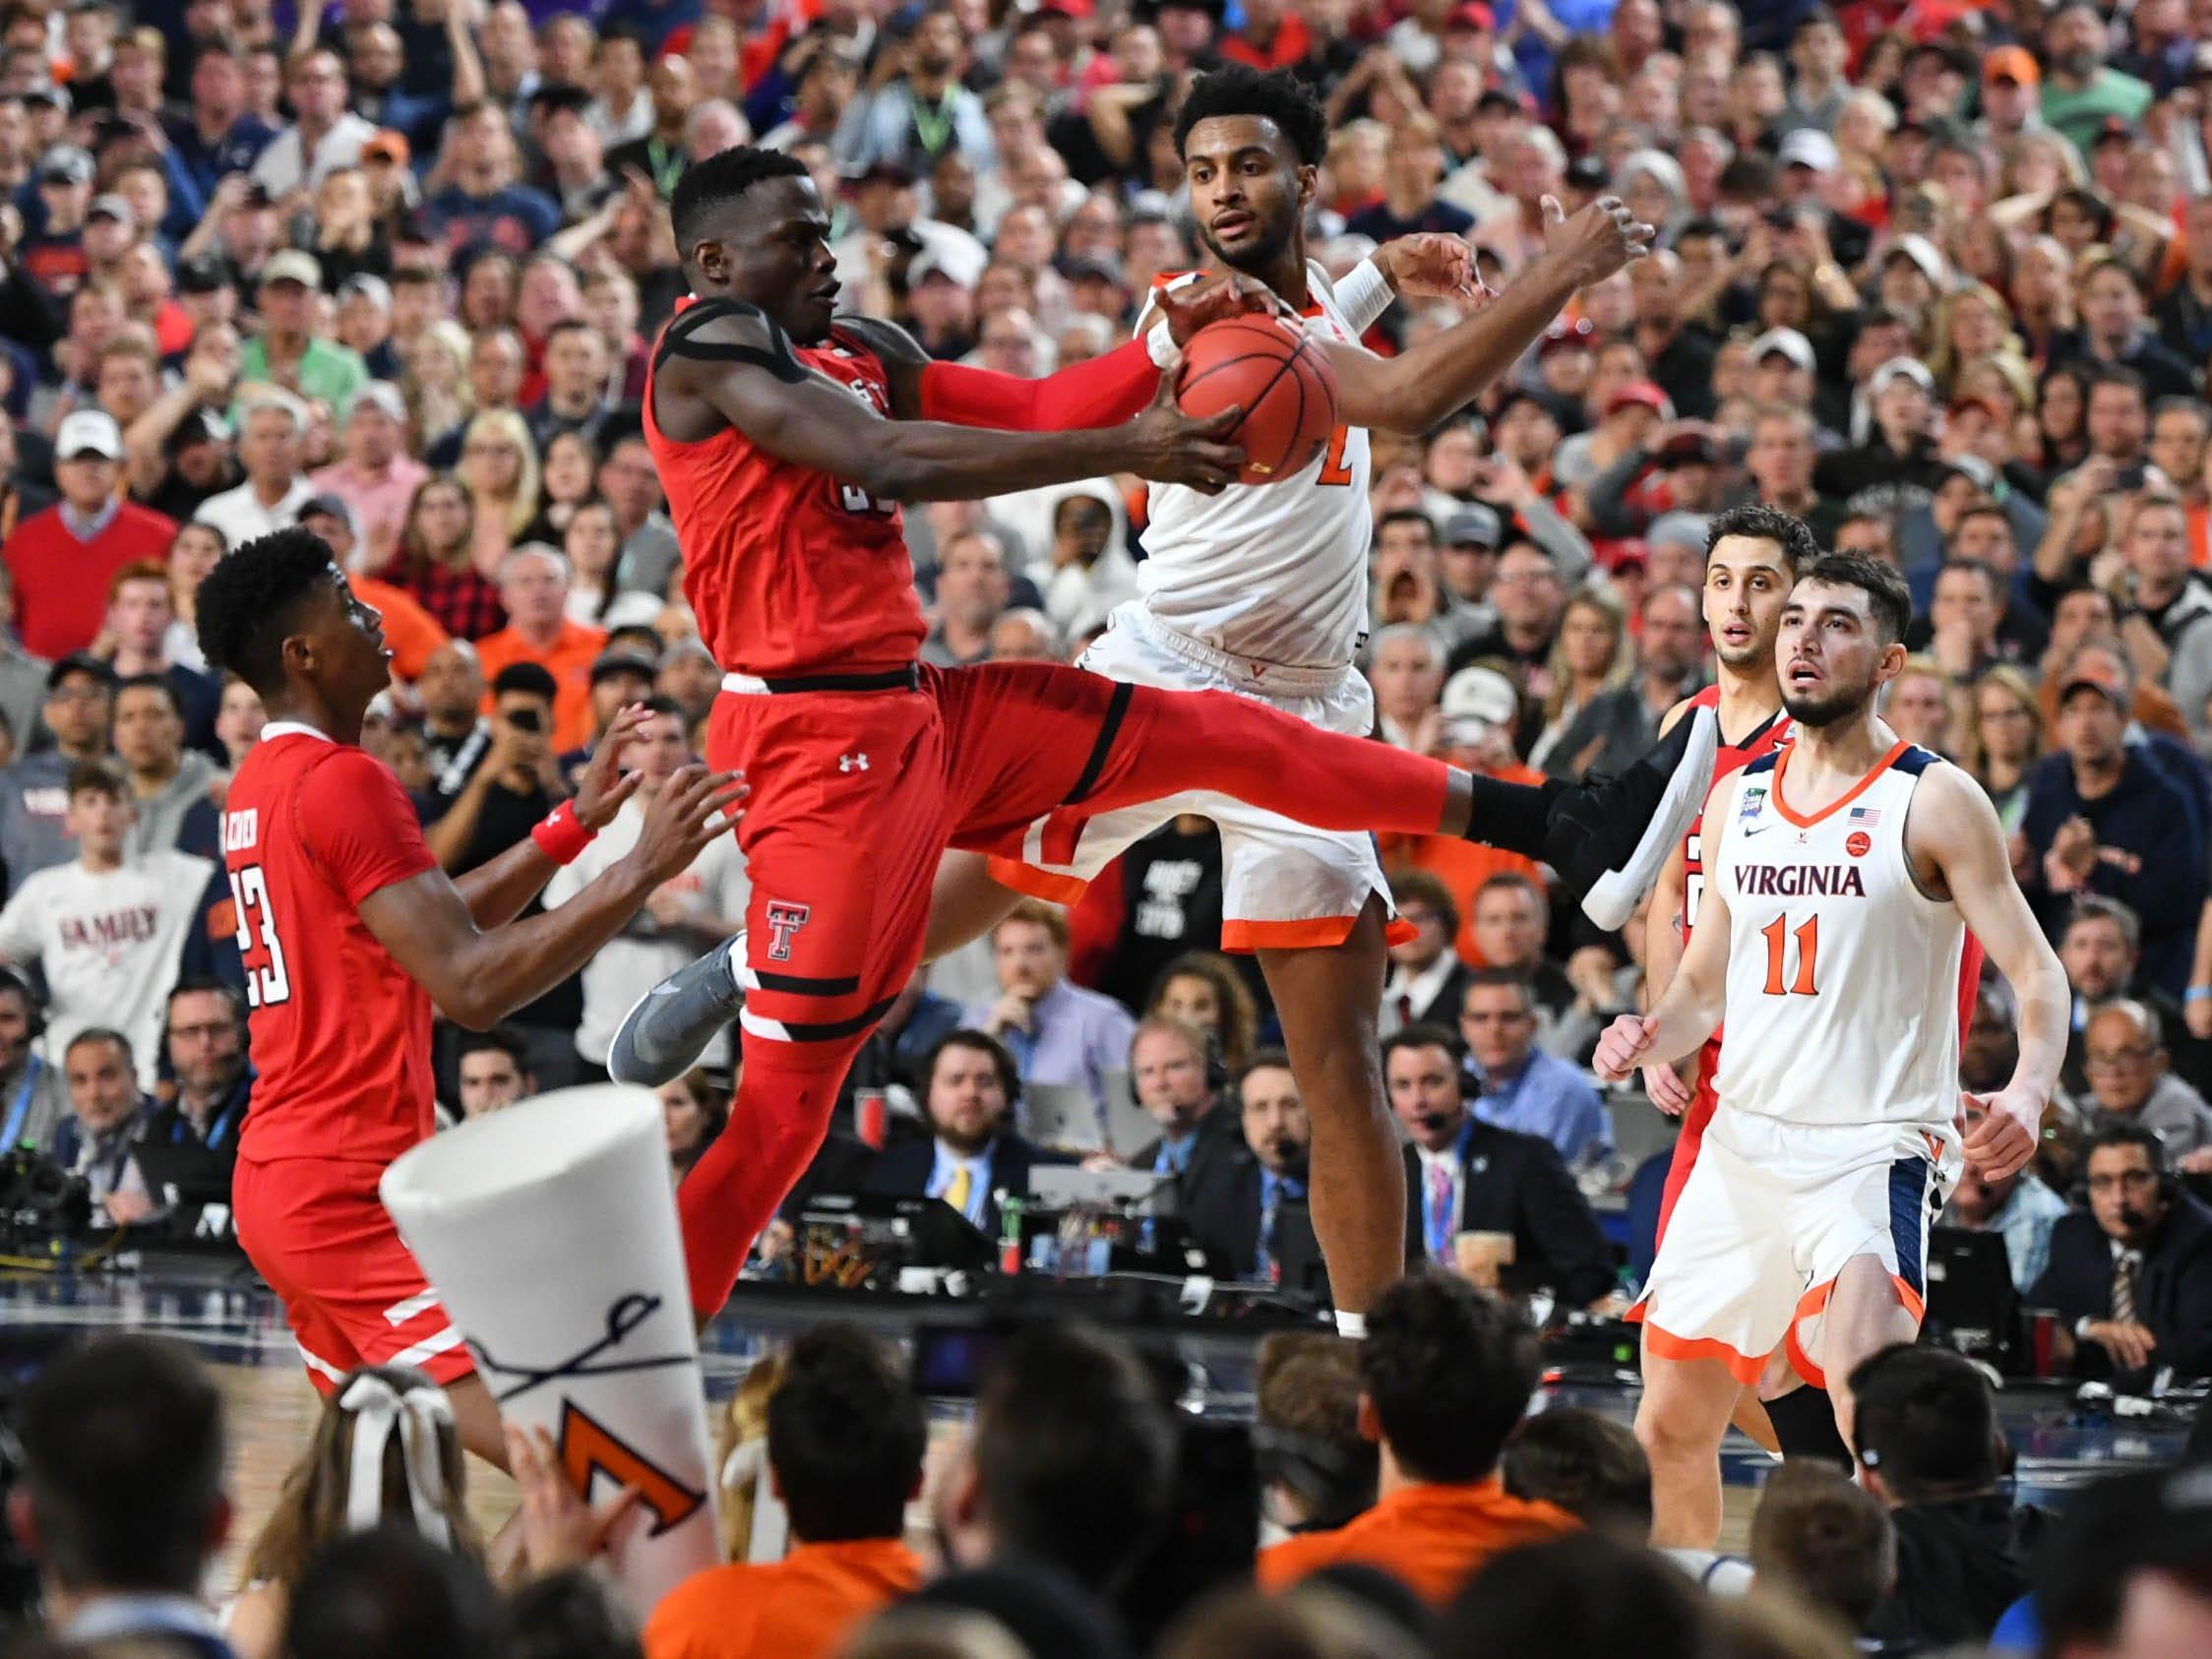 Texas Tech's Norense Odiase battles for a rebound with Virginia's Braxton Key.